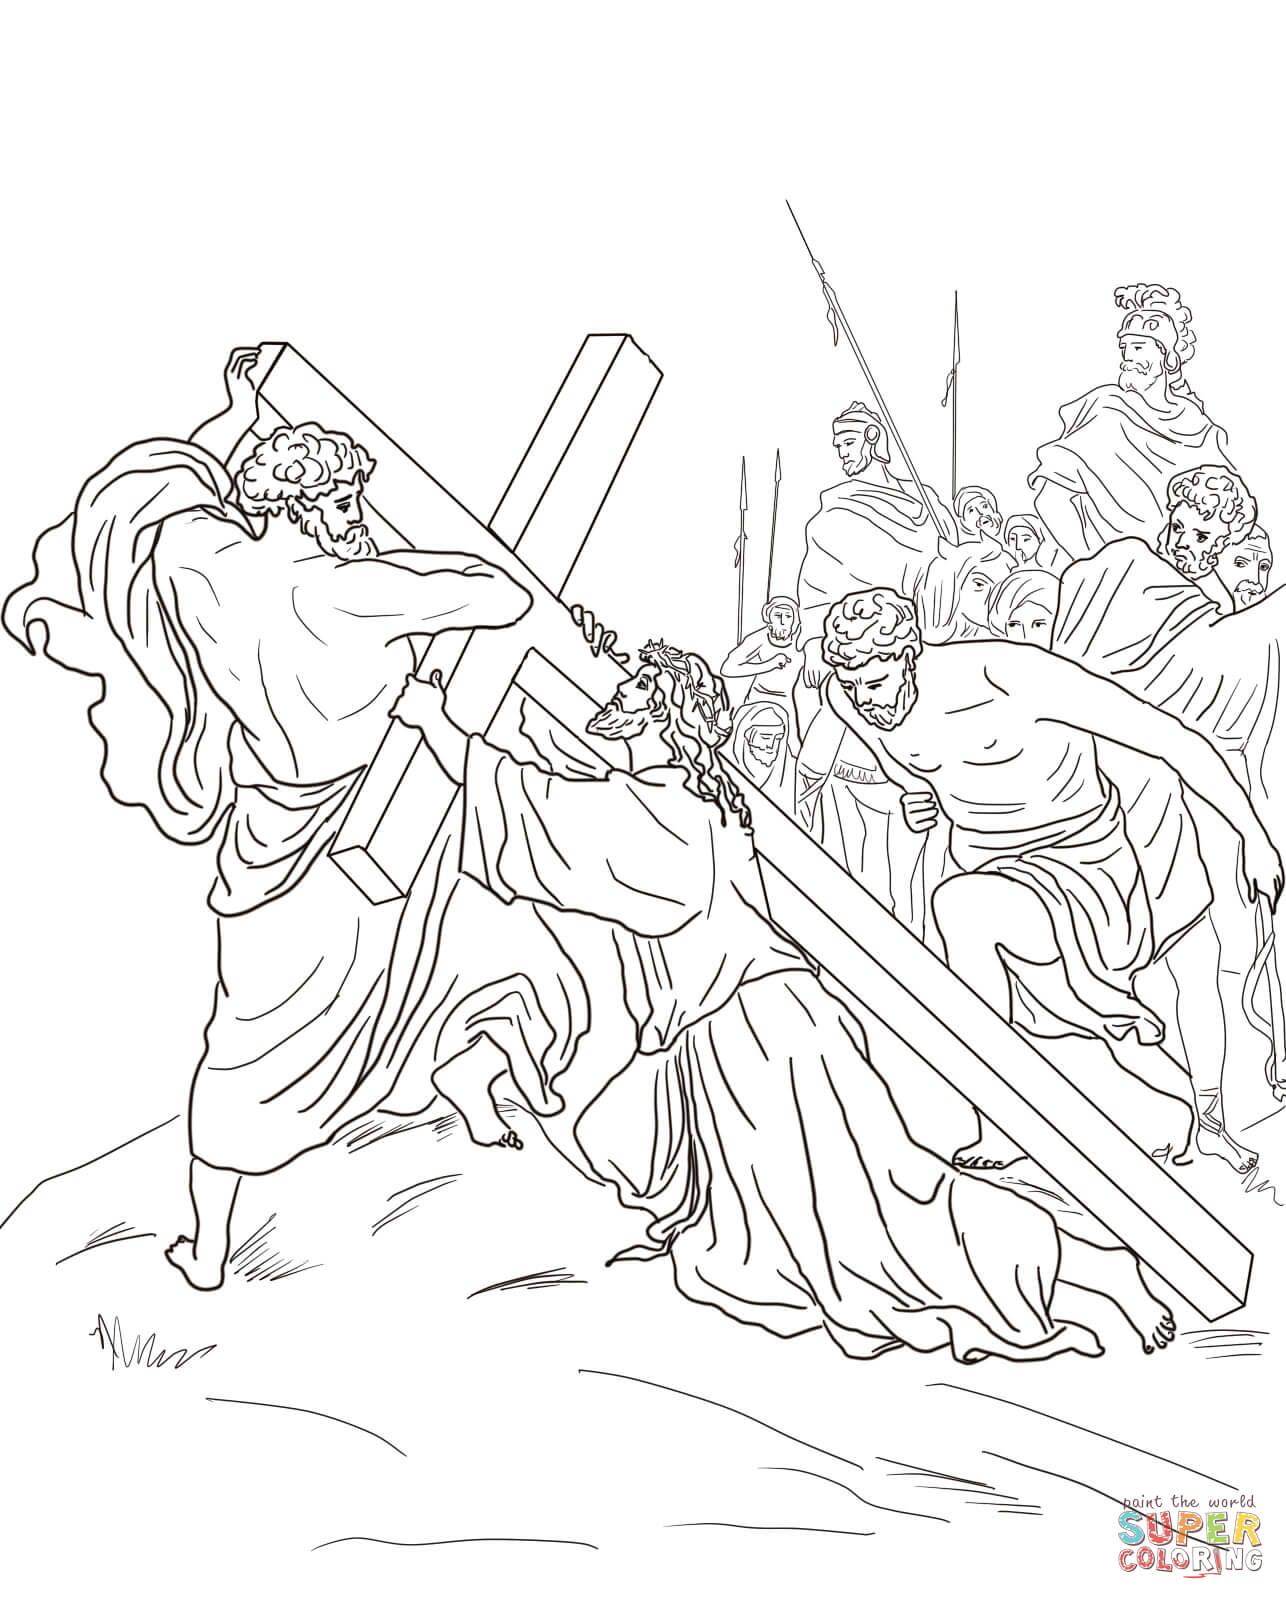 Ausmalbild: 5. Station: Simon von Cyrene hilft Jesus das